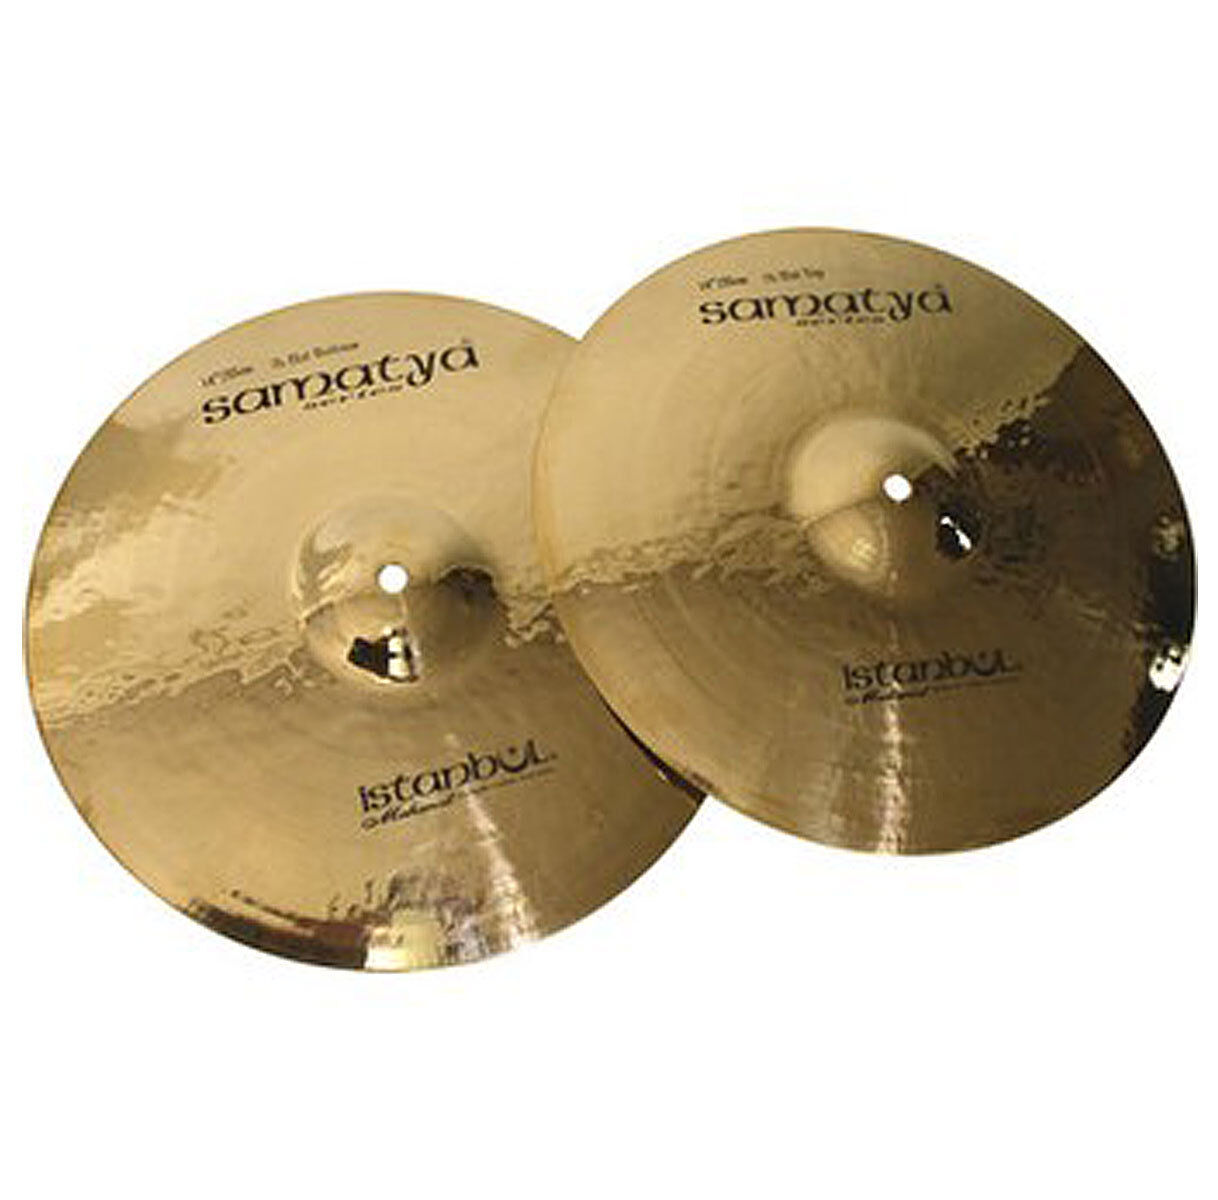 Istanbul Mehmet Samatya Brilliant Hi Hat 14   Cymbals Cymbal